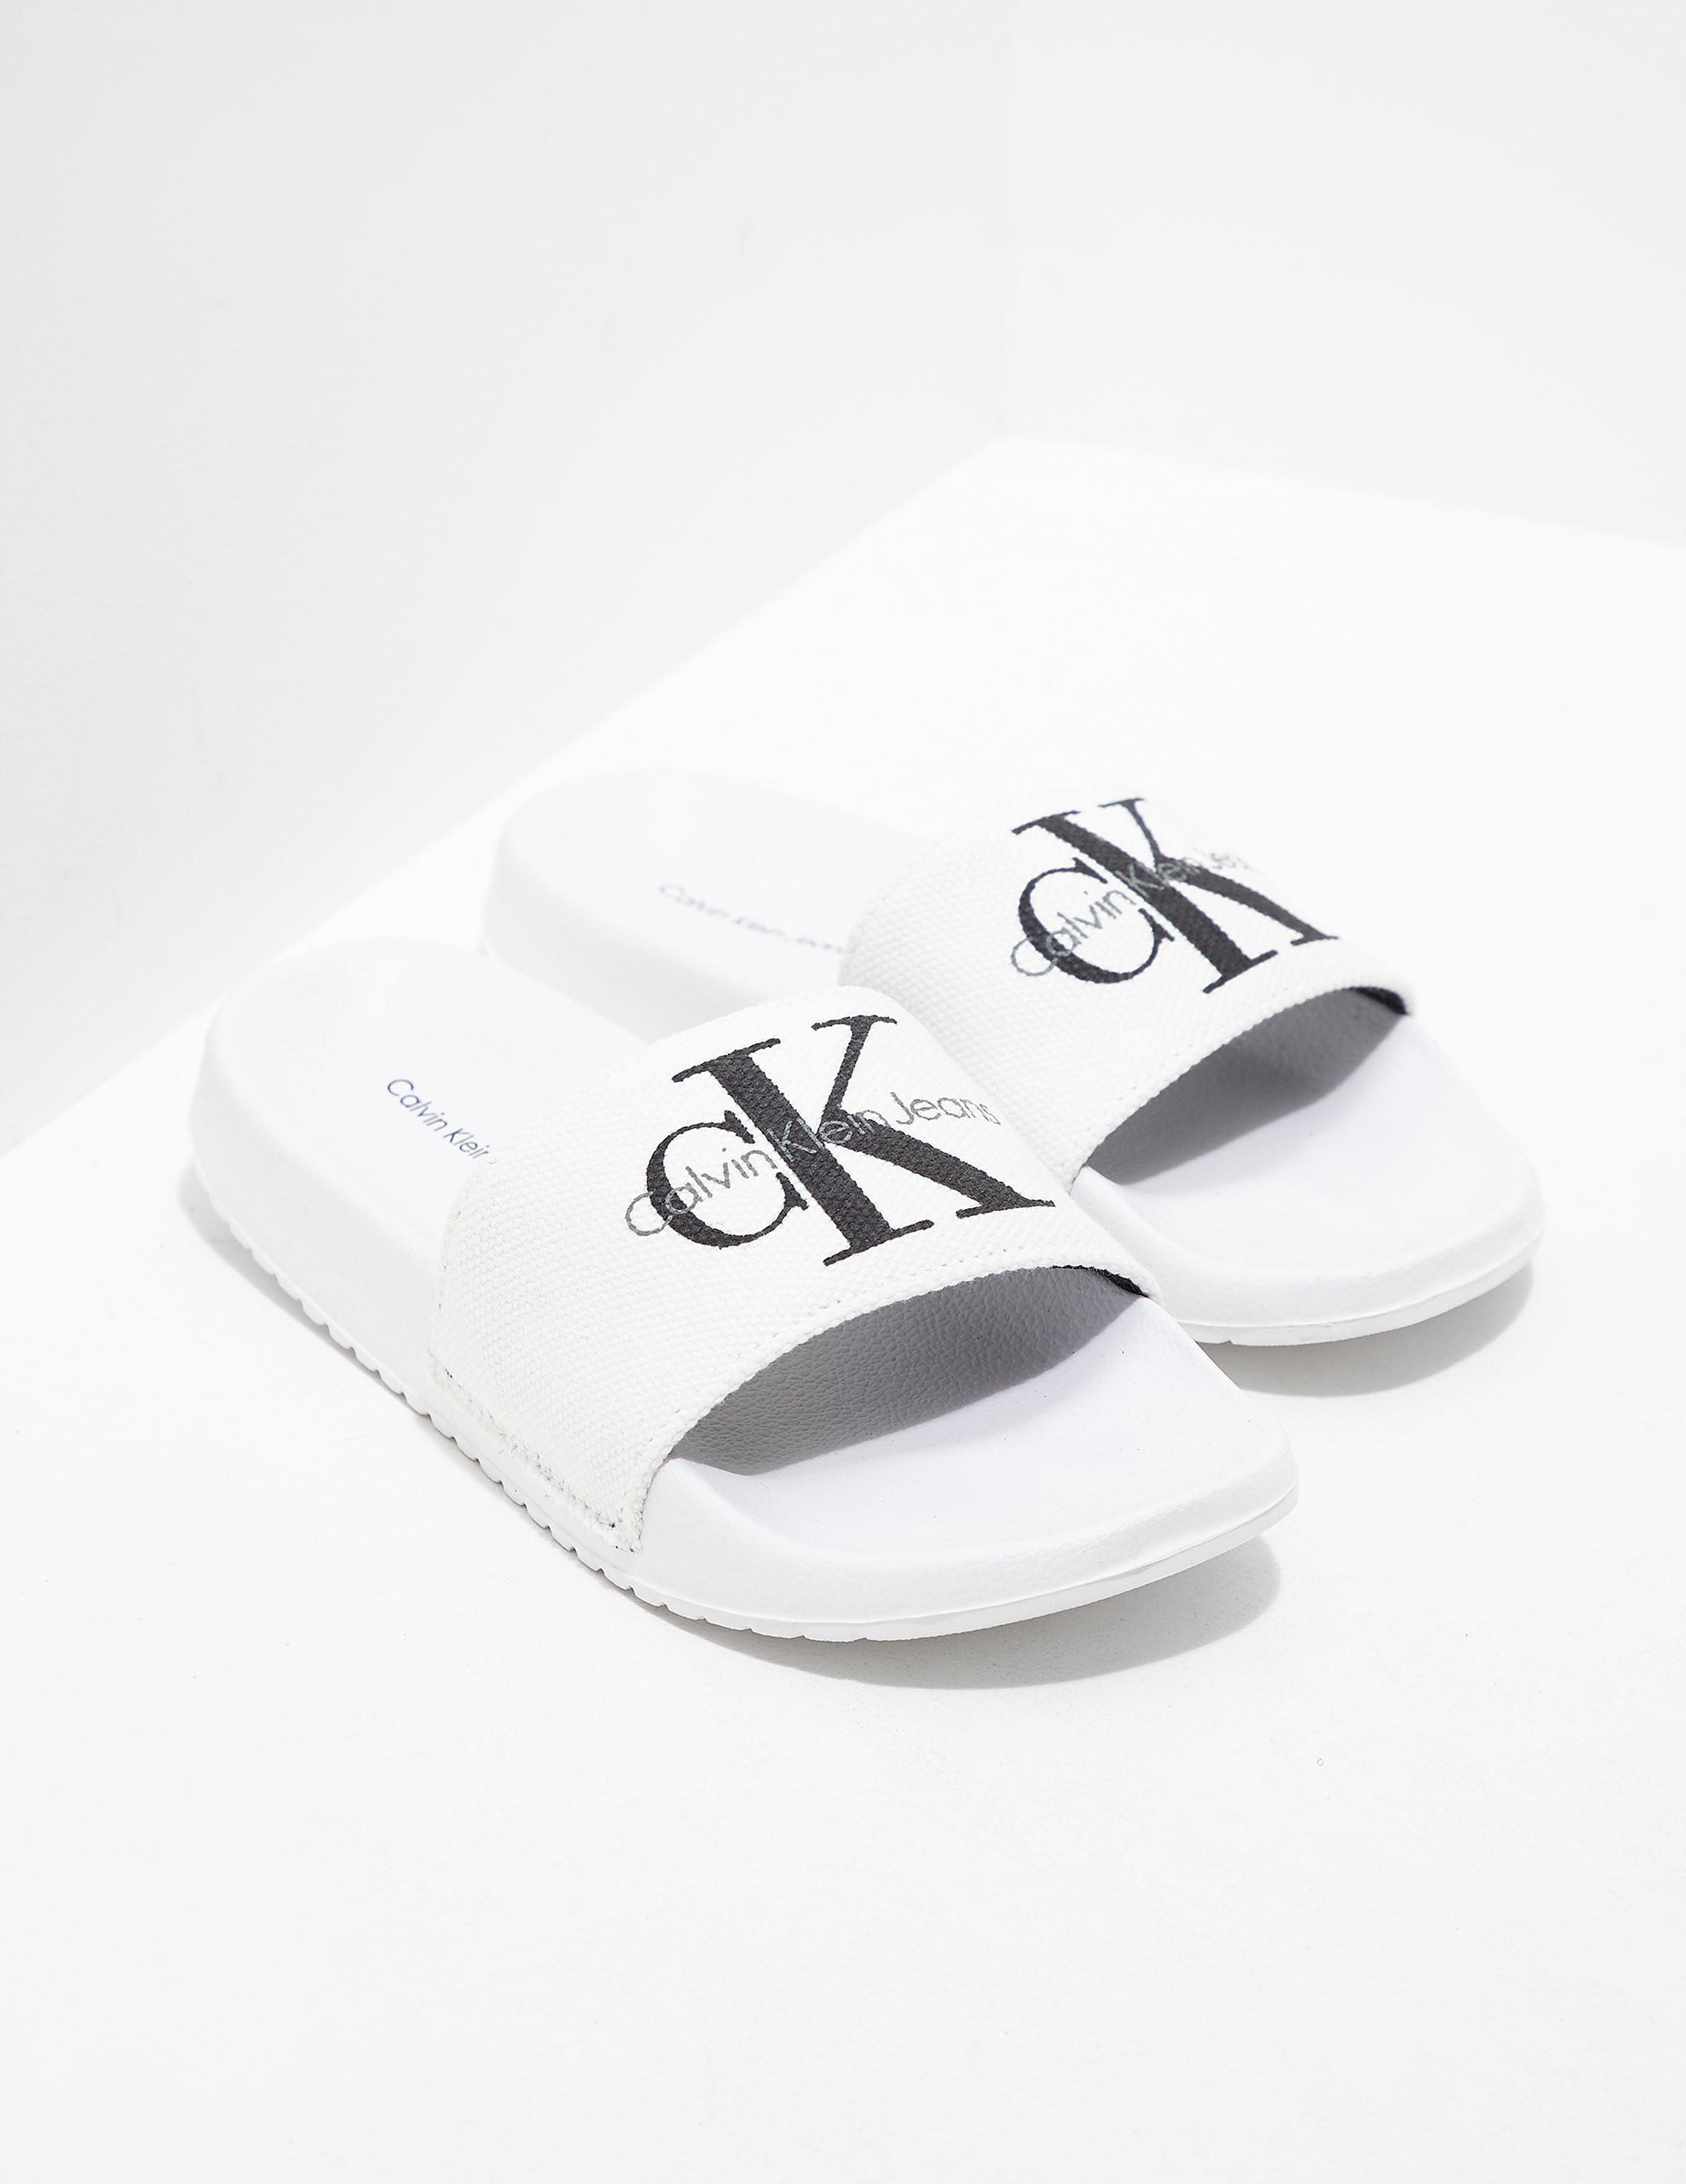 Calvin Klein Chantal Slides